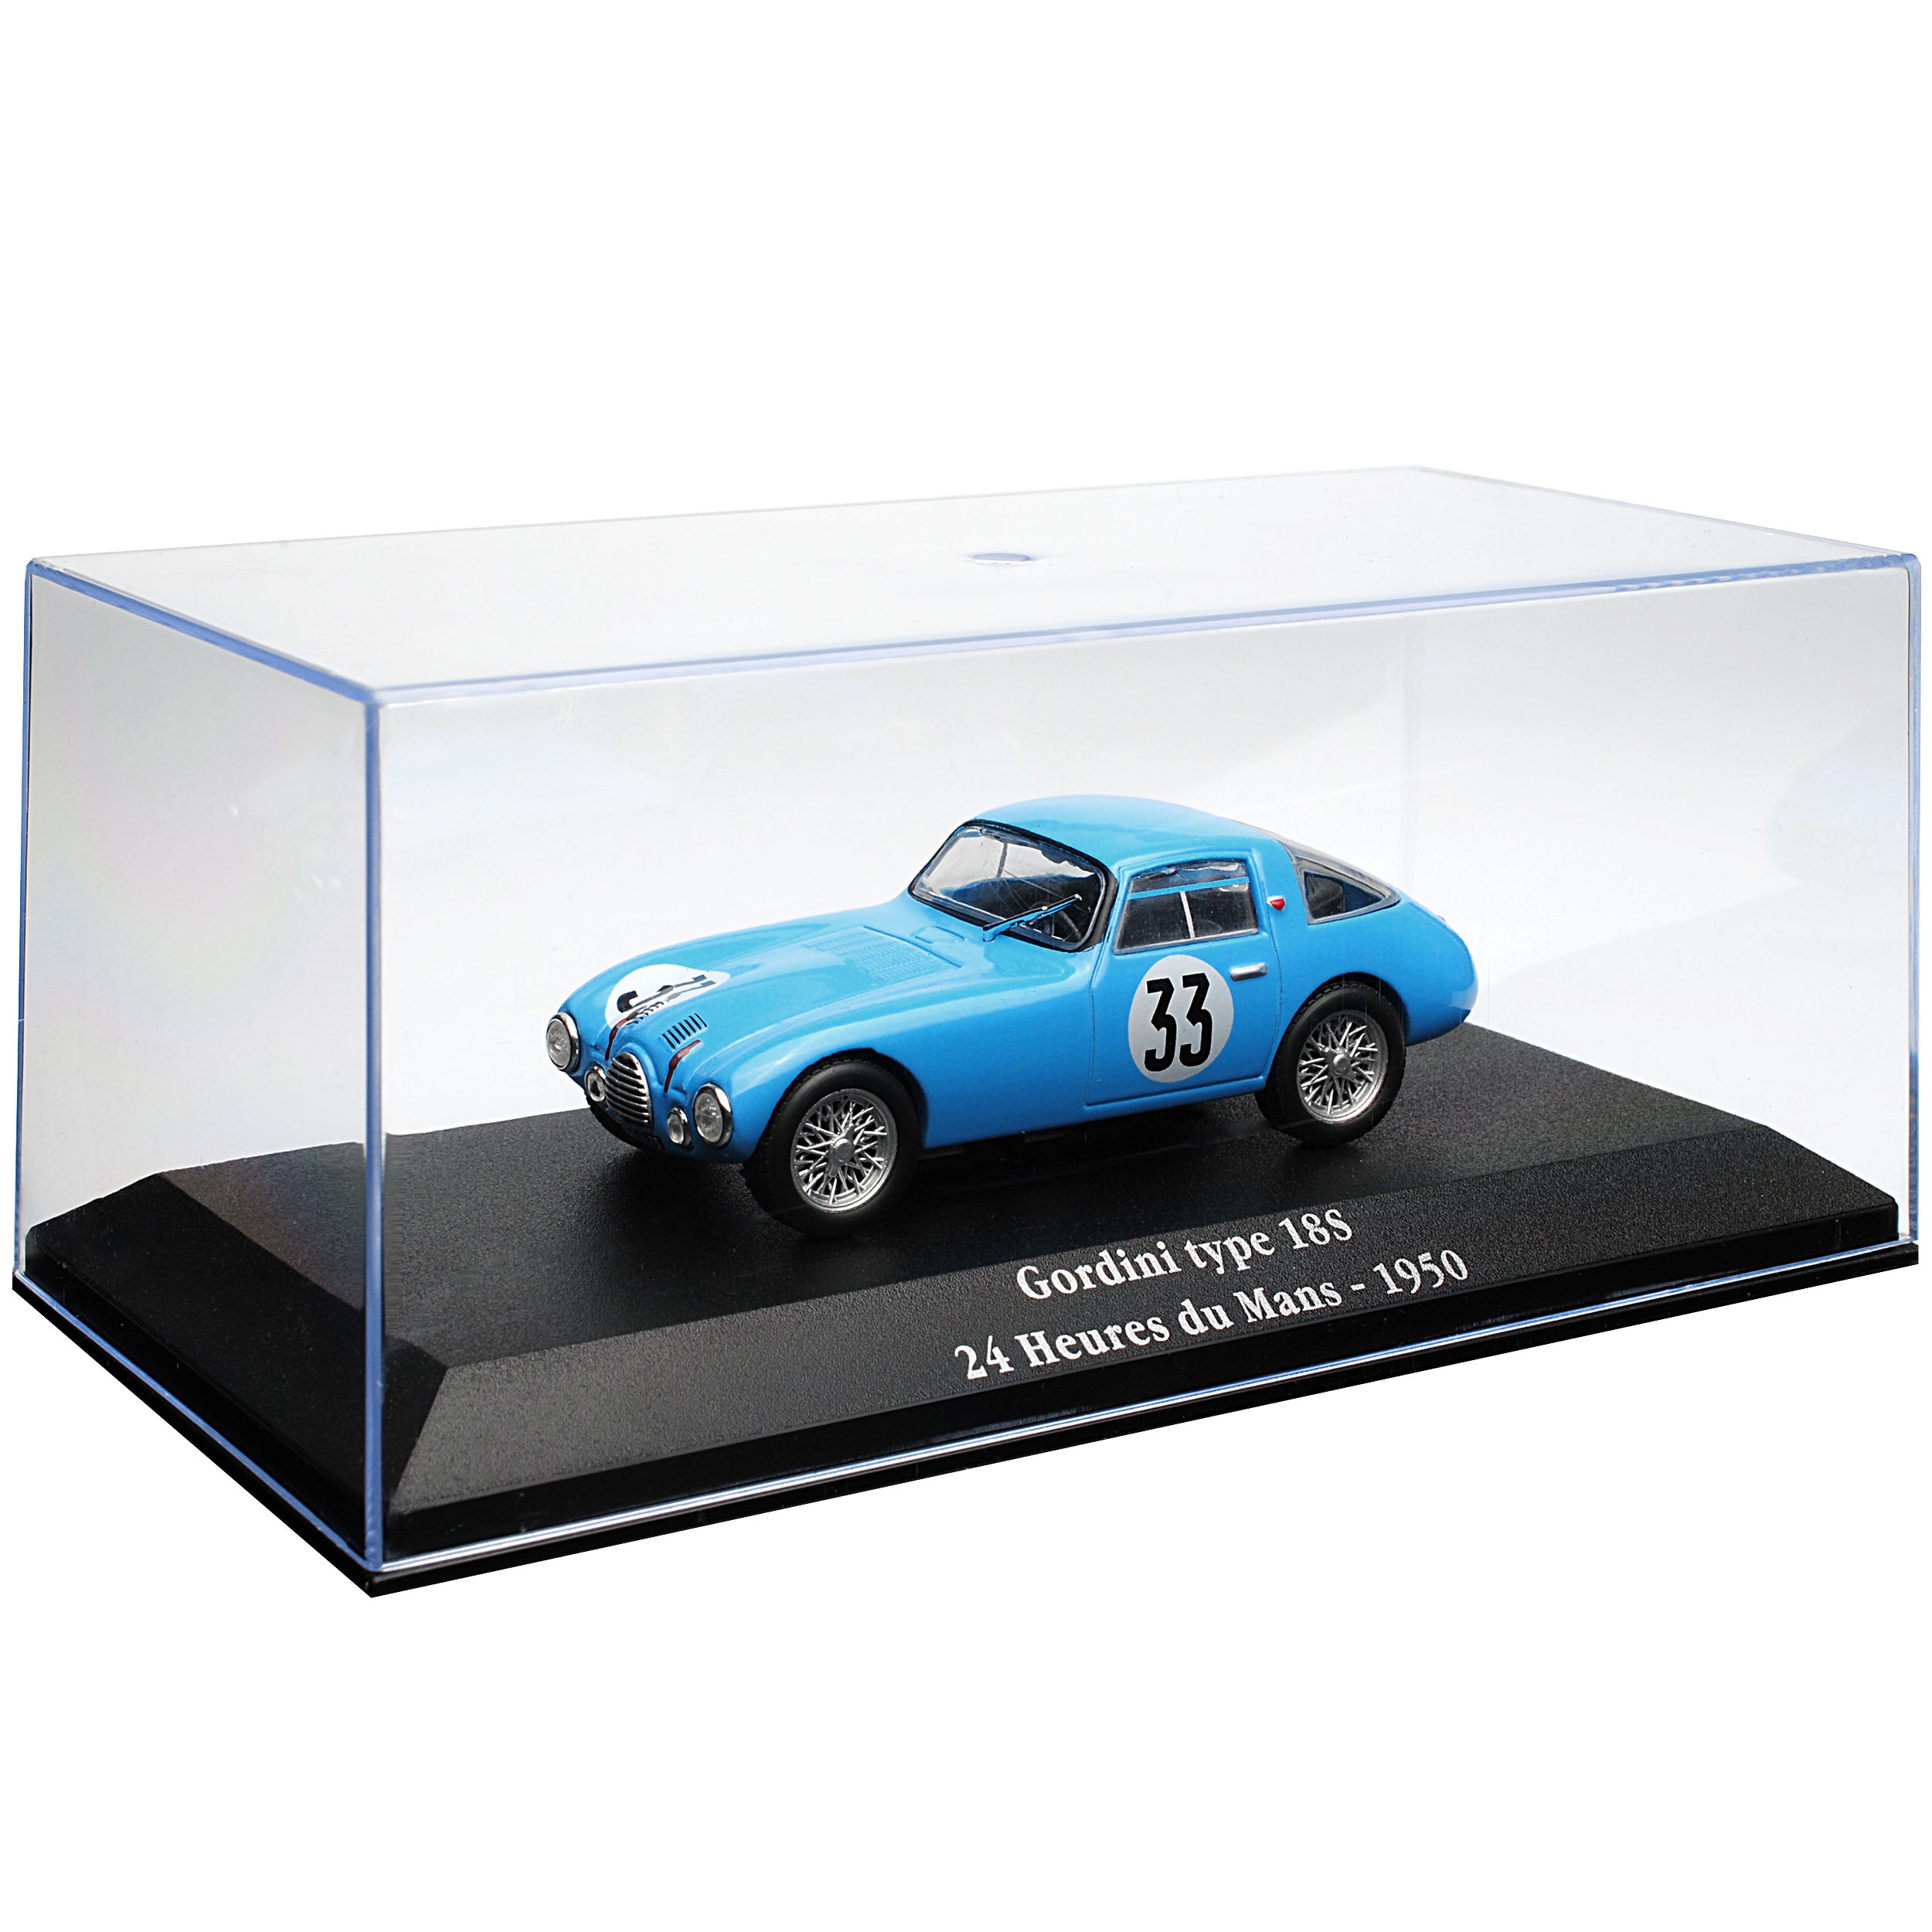 Renault-Gordini-Type-18s-24h-tu-le-mans-1950-1-43-atlas-modelo-coche-con-o-o miniatura 9